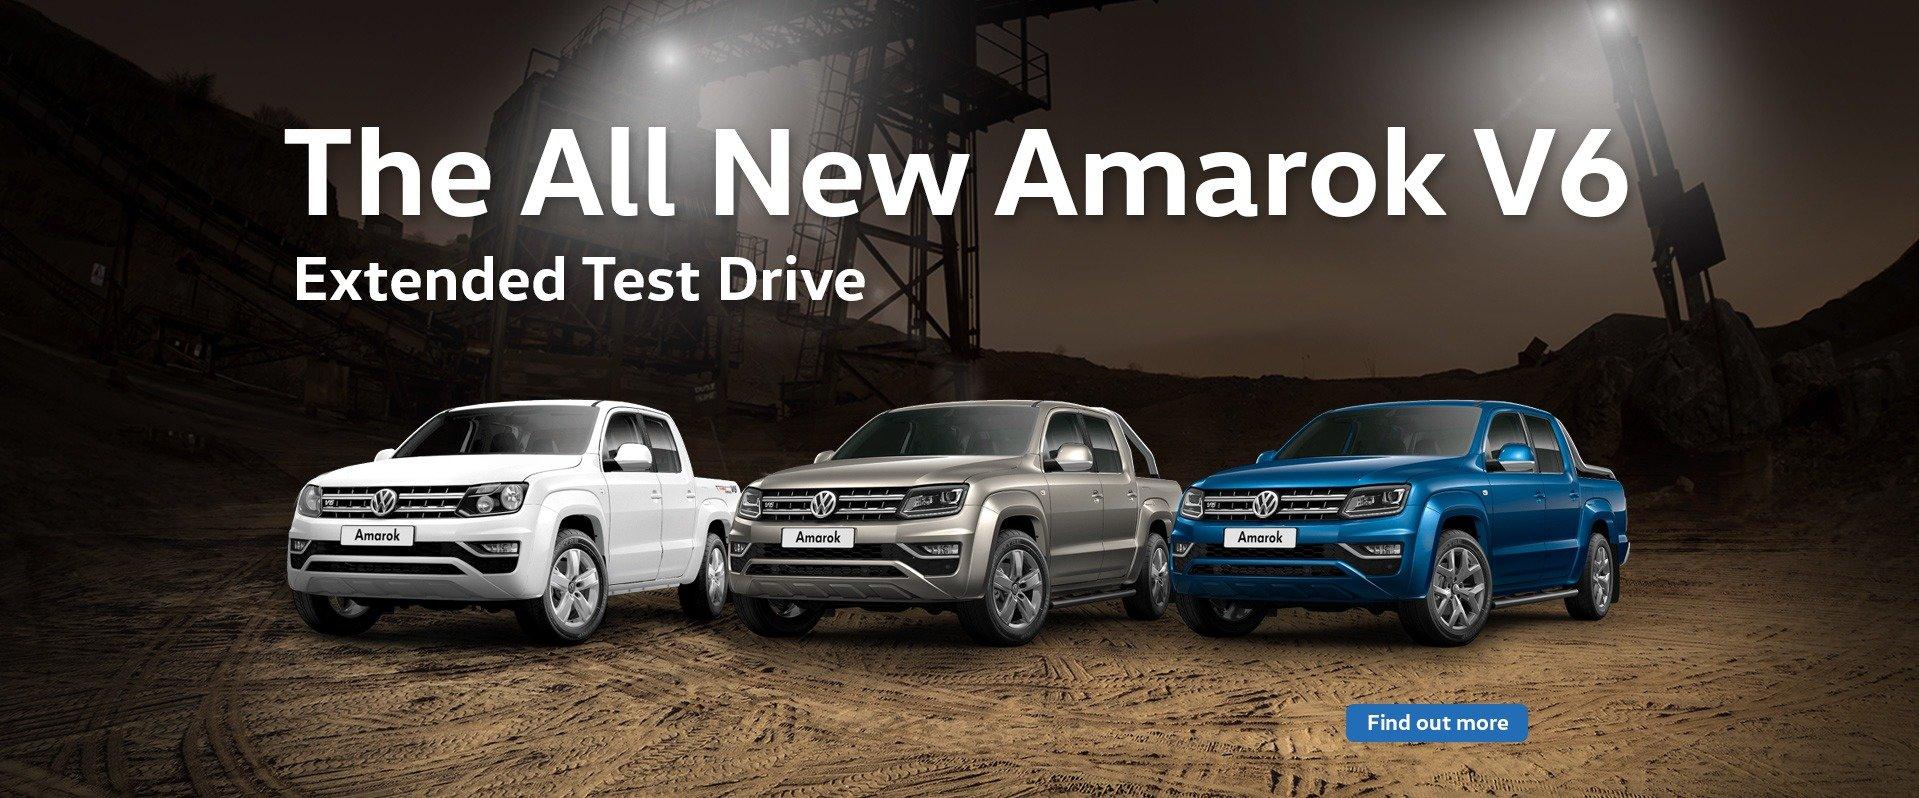 Amarok Test Drive